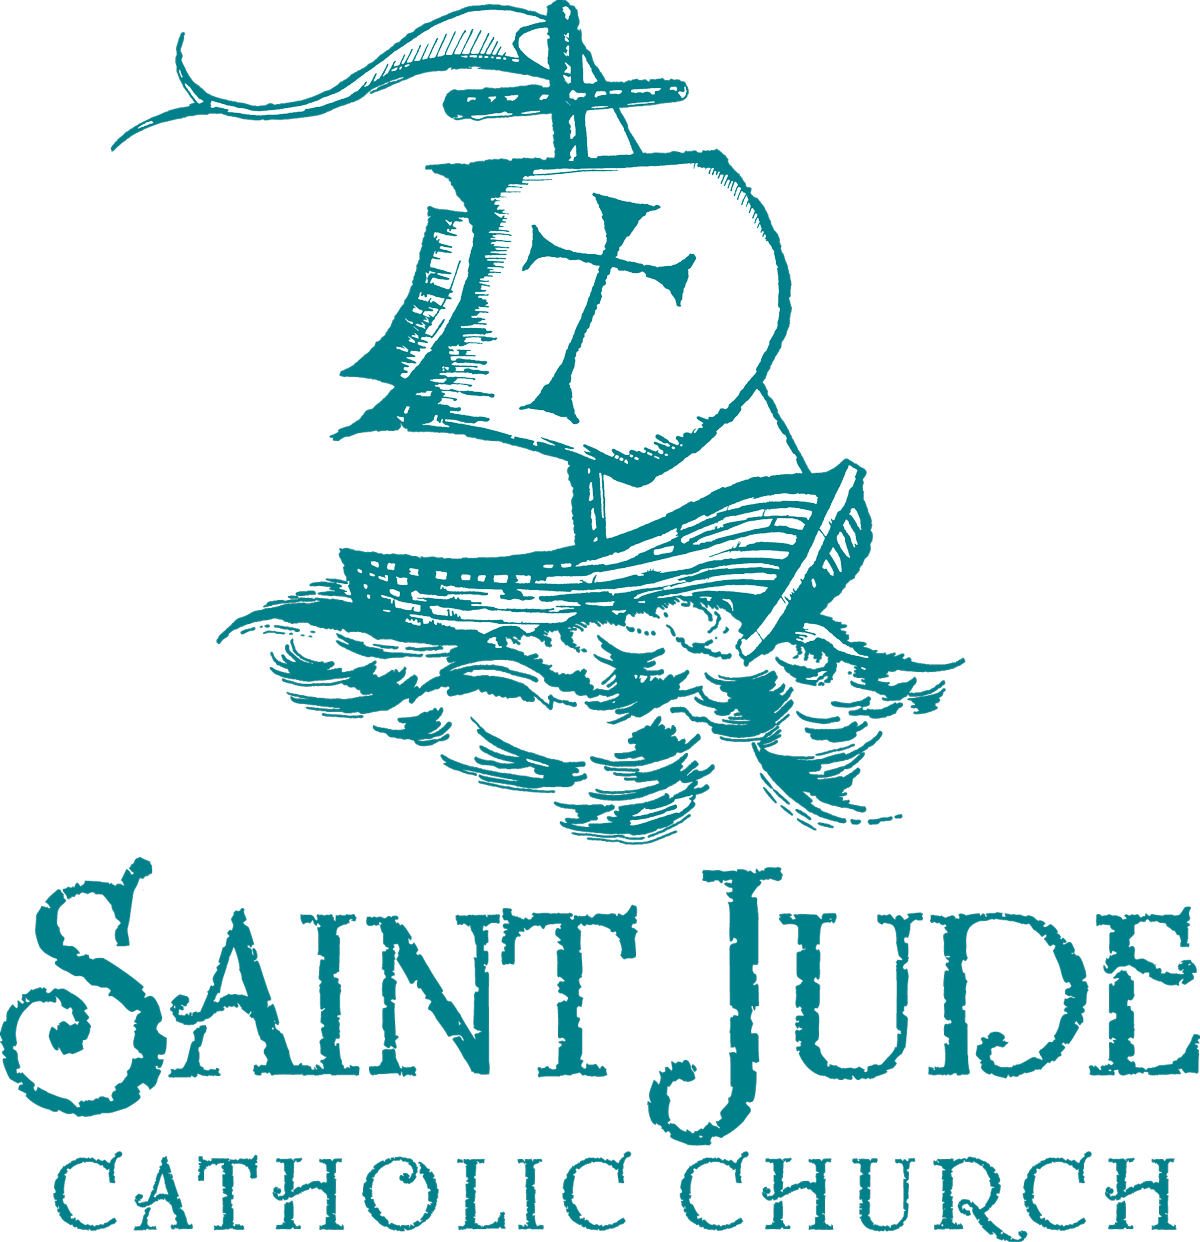 St. Jude Catholic Church